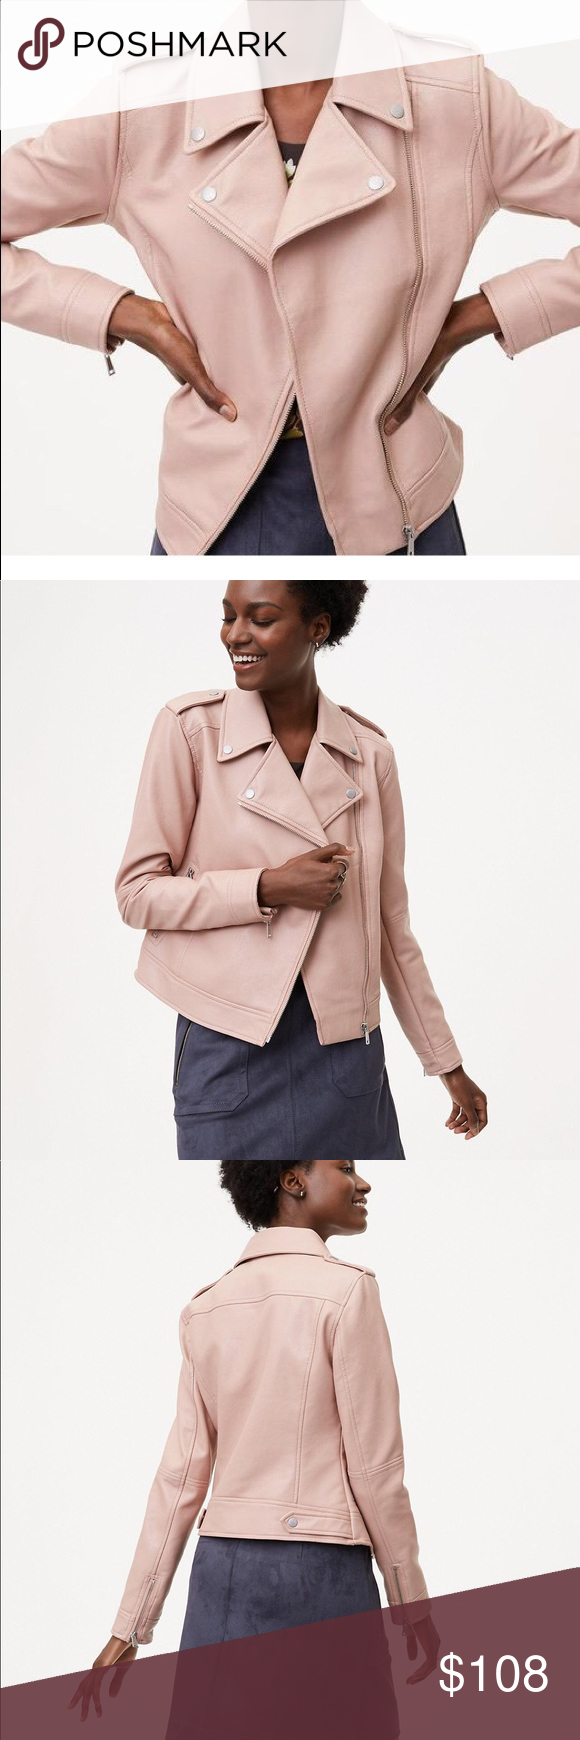 Loft Blush Faux Leather Jacket Brand New Leather Jacket Brands Fashion Chic Boutique